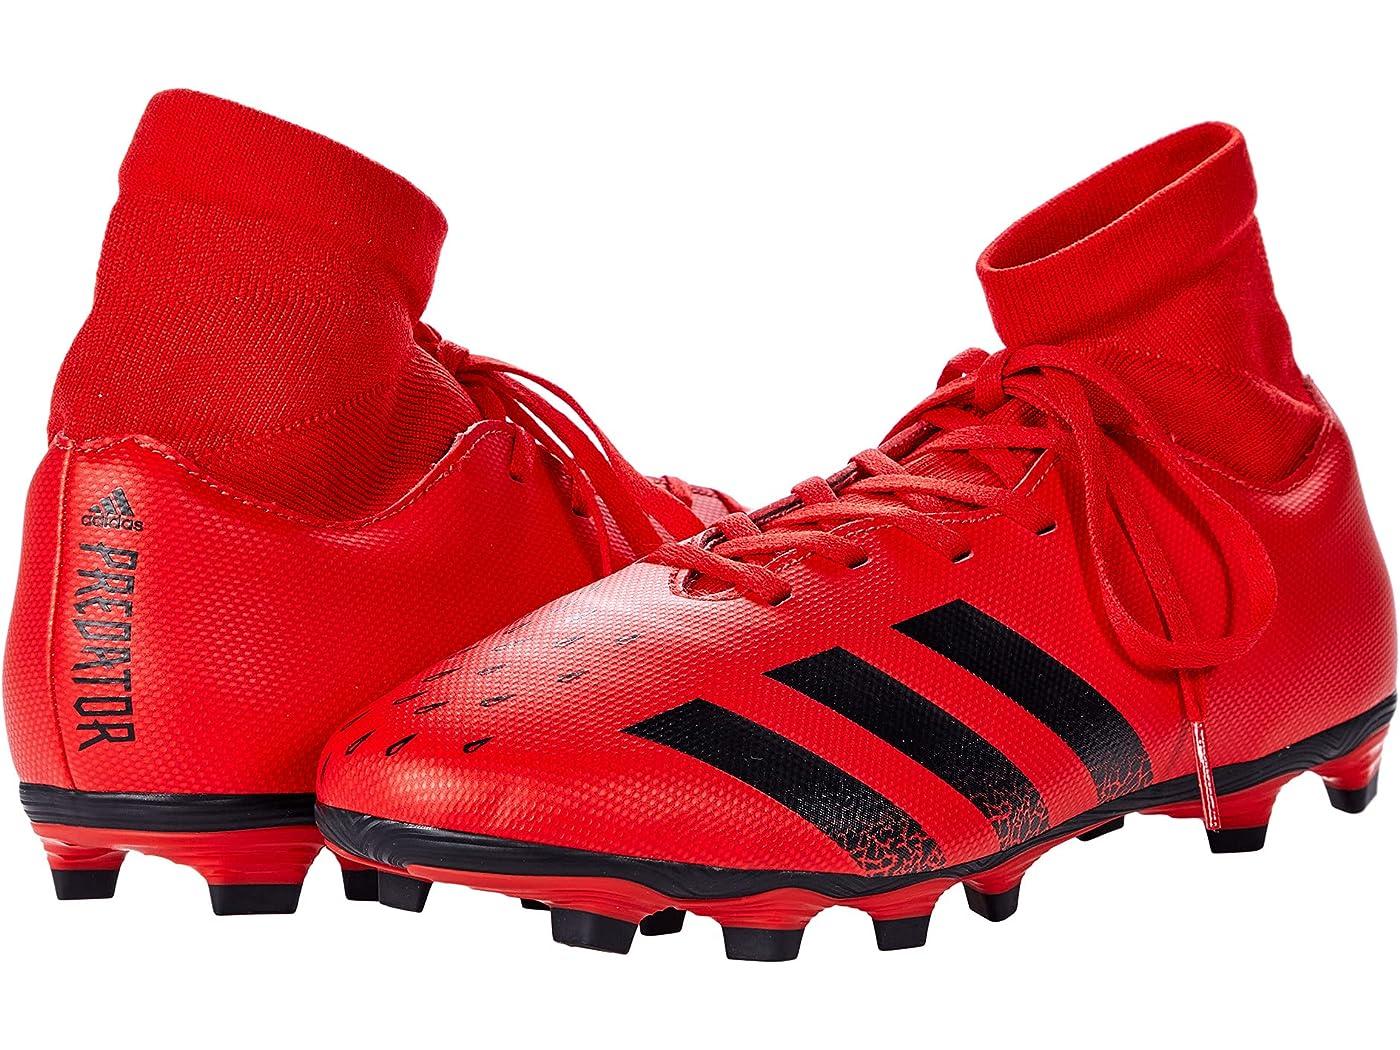 Adidas Predator Freak 4 S Firm Ground Soccer Cleats